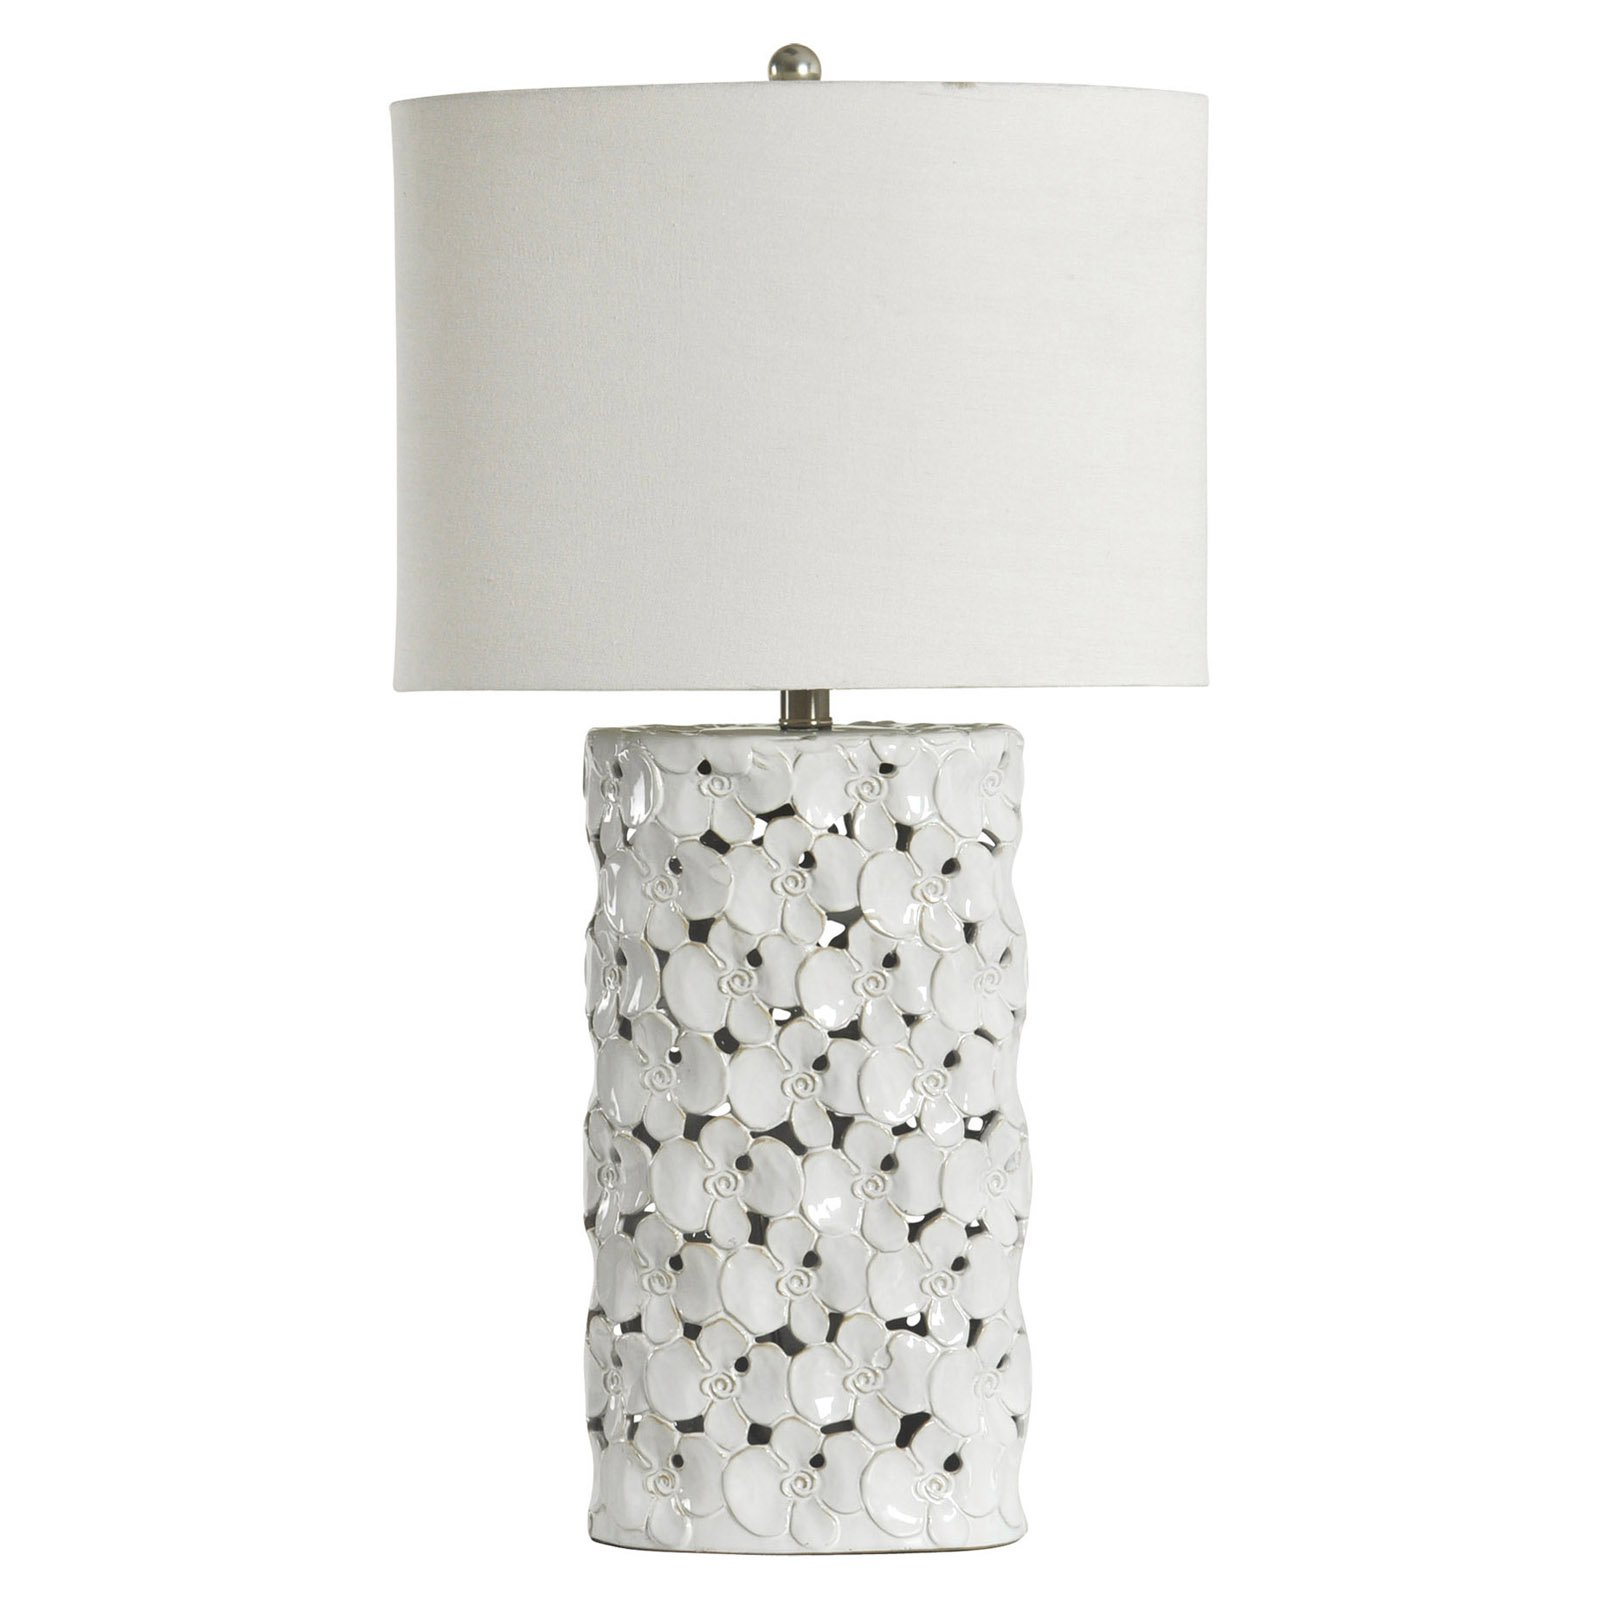 Stylecraft Halifax Ceramic Table Lamp With Images White Table Lamp Ceramic Table Lamps Lamp